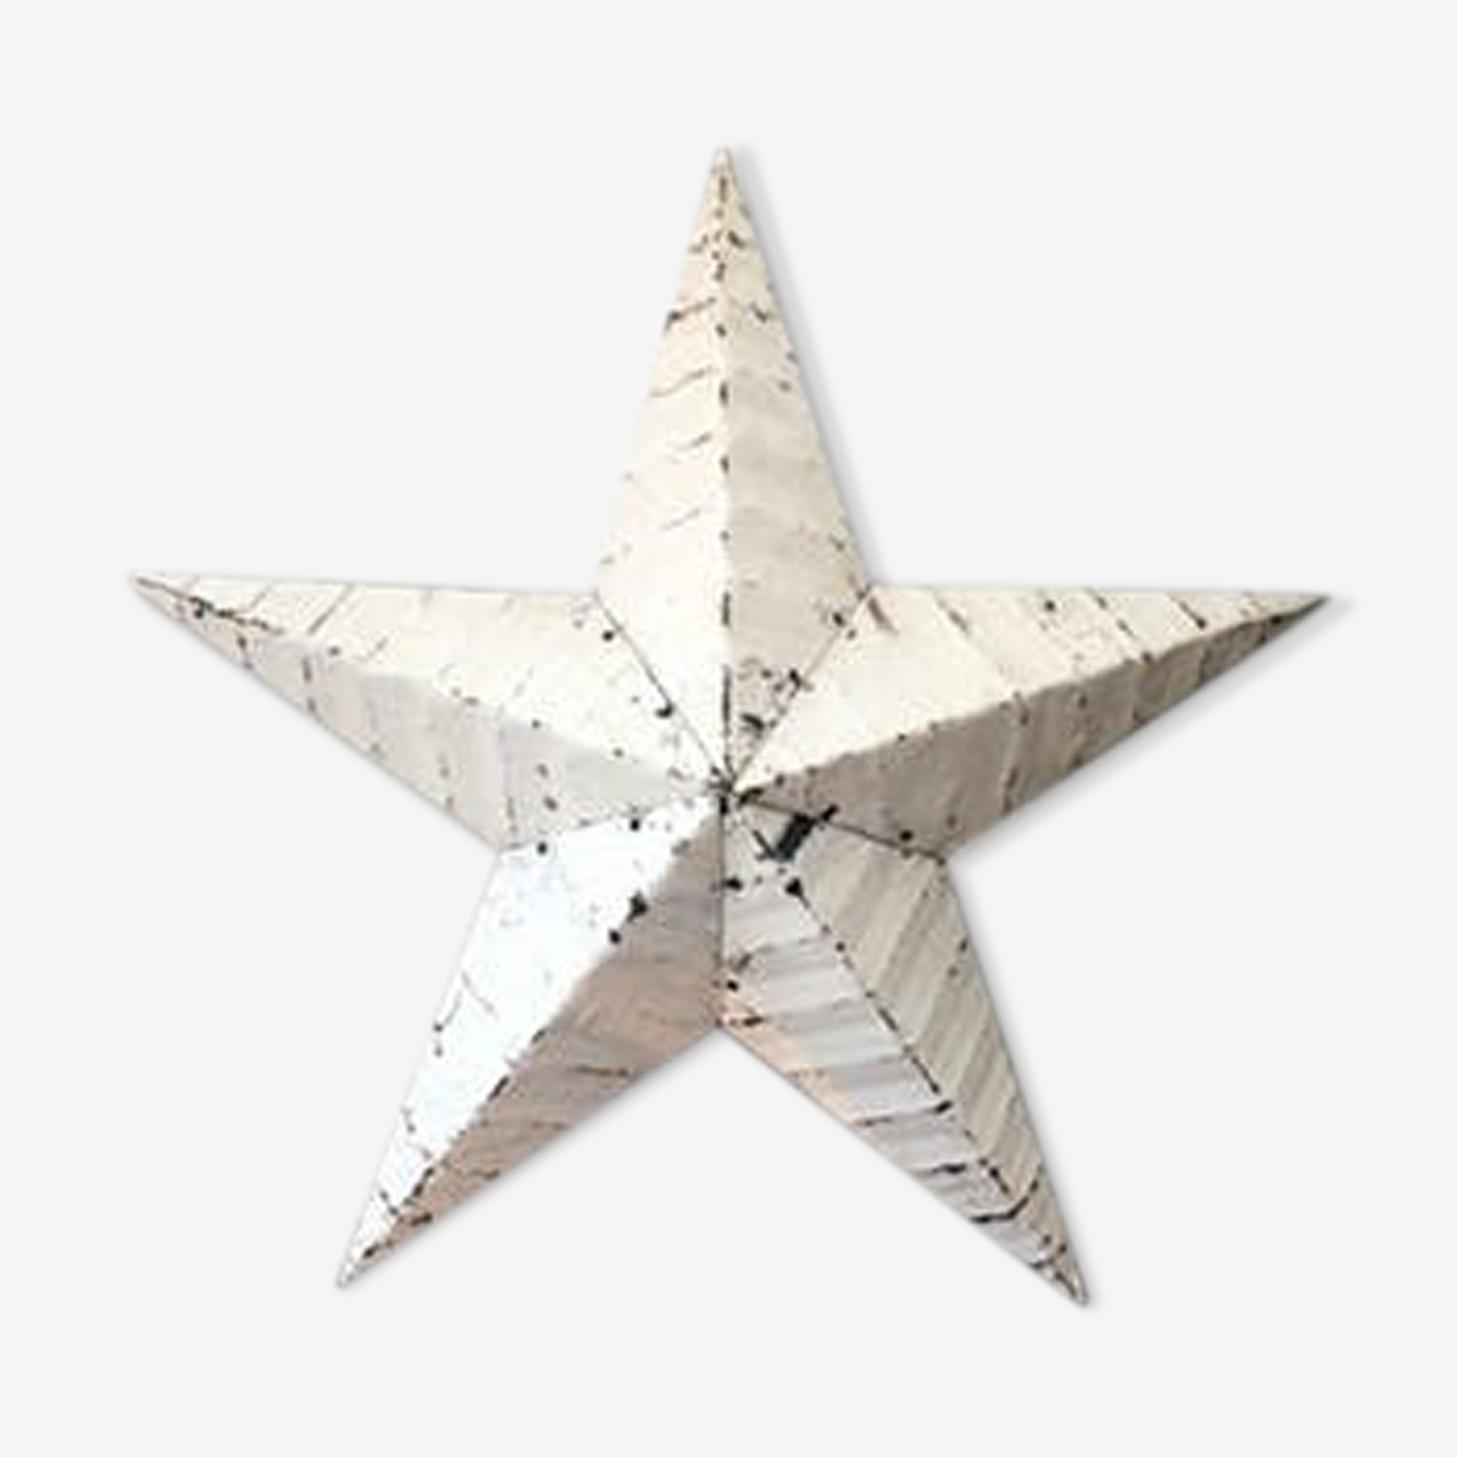 Star white amish - 60 cm in diameter